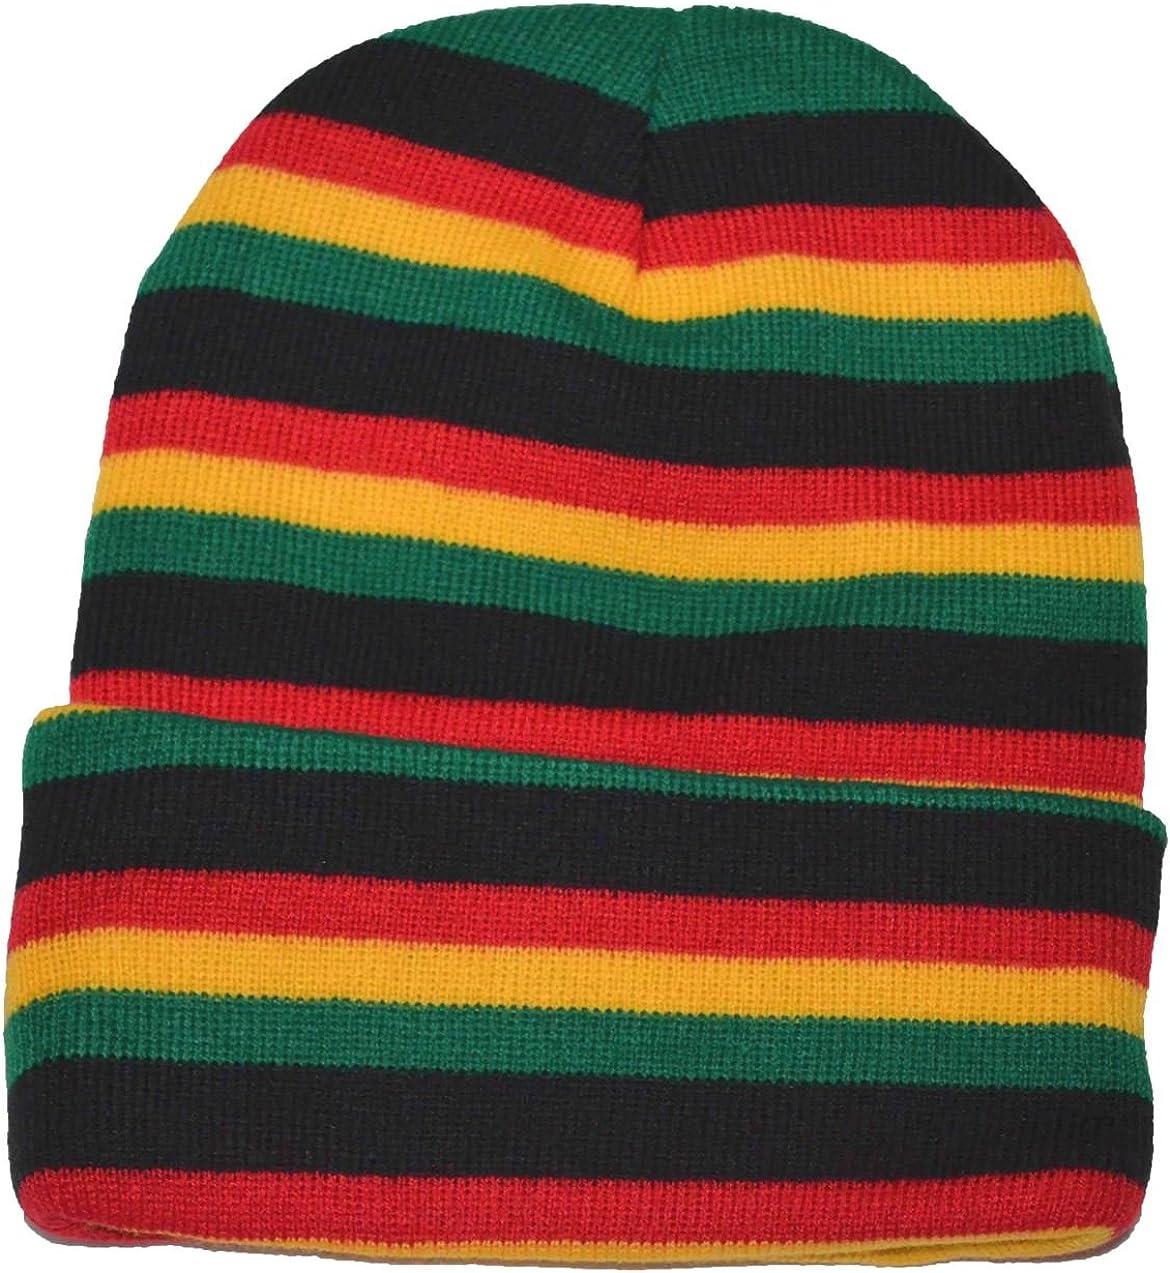 Pyin Men's Rasta Long Beanie Knit Hat Yellow Green Price reduction Black Red Seattle Mall